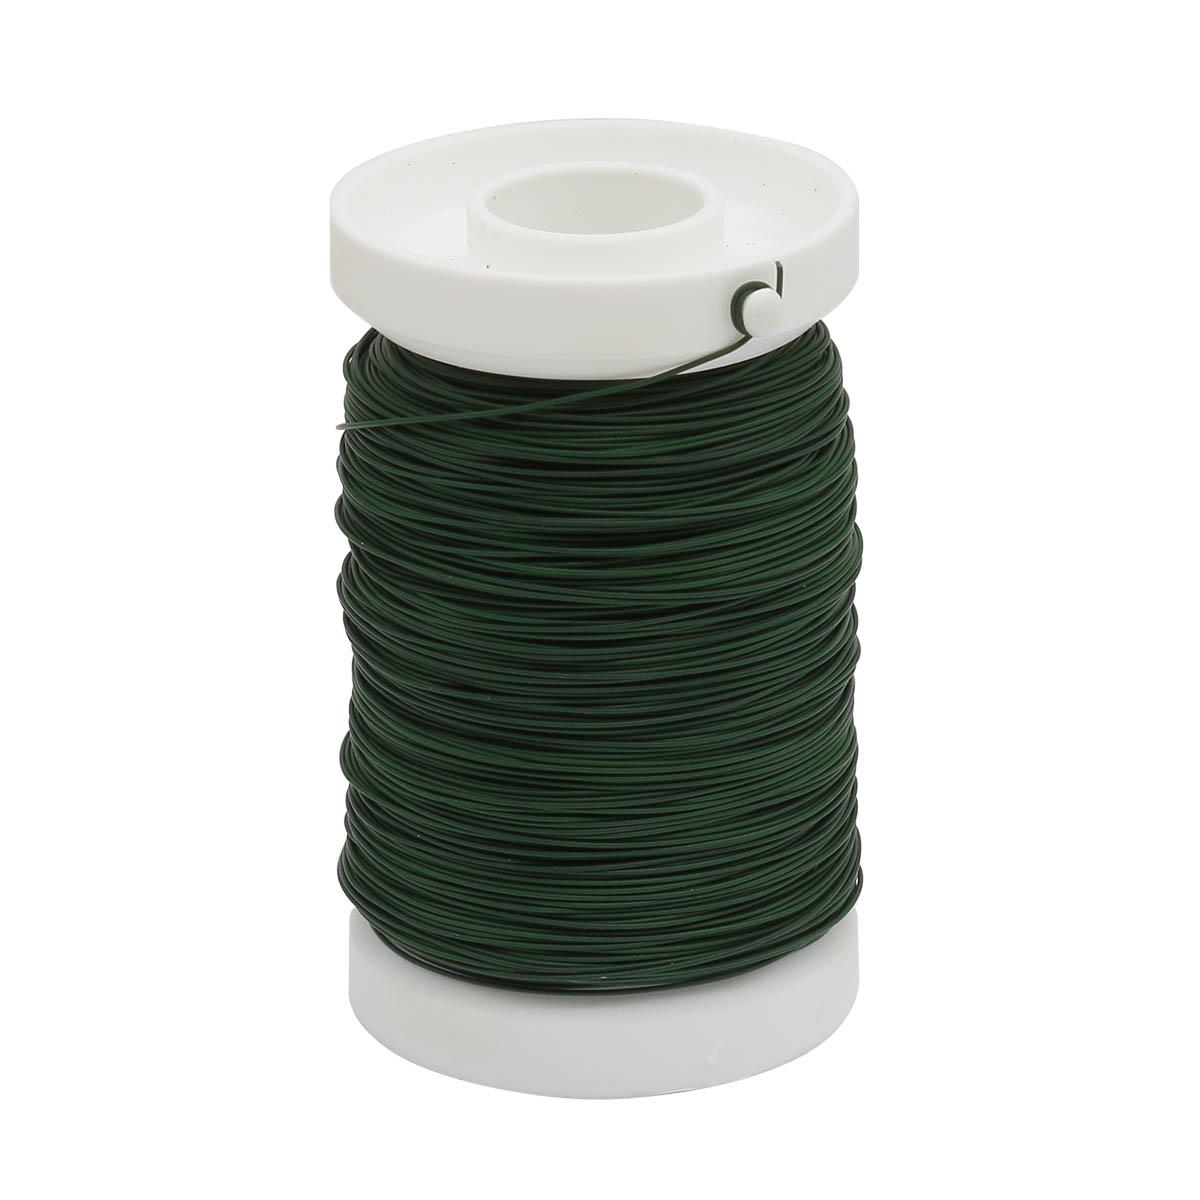 62220060 Проволока для флористики на катушке, диам. 0,35мм, цв. зеленый цв., 100м Glorex